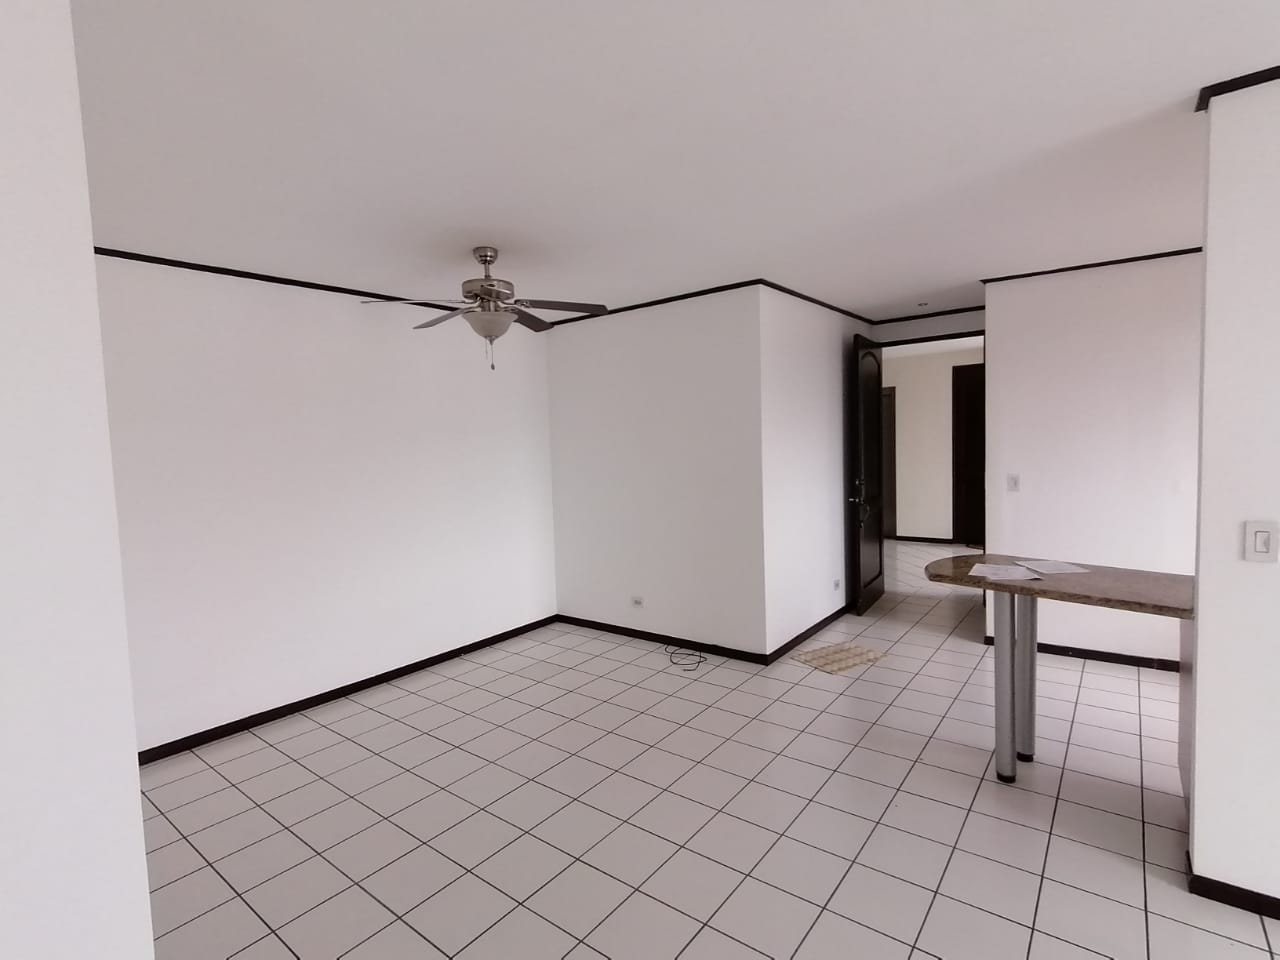 2318 For Rent Condo in Sabana Oeste